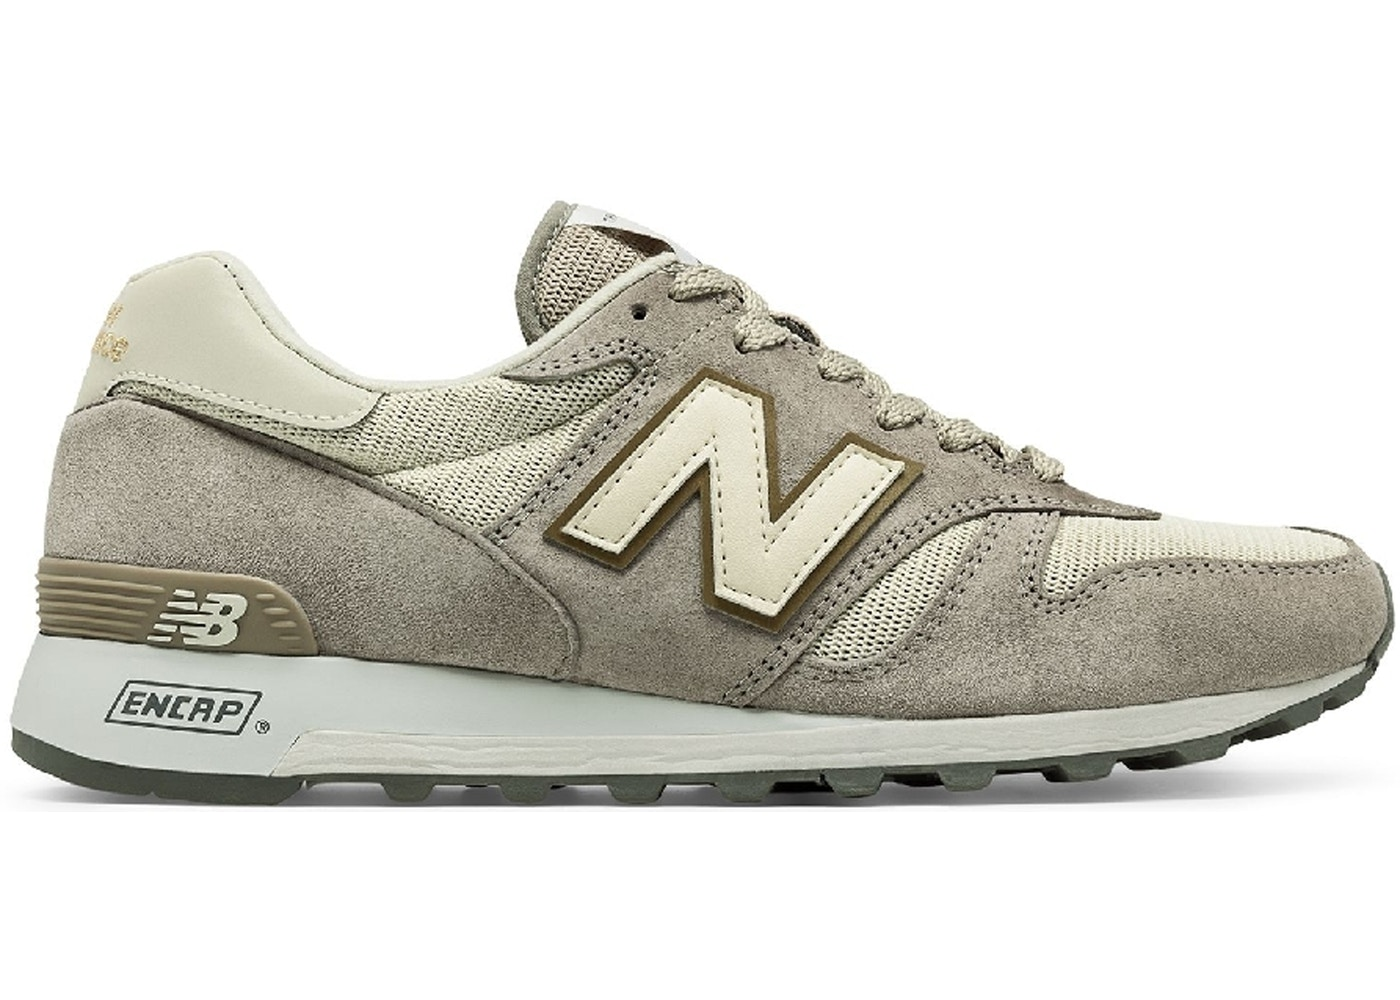 New Balance 1300 Grey Gold - M1300CWB